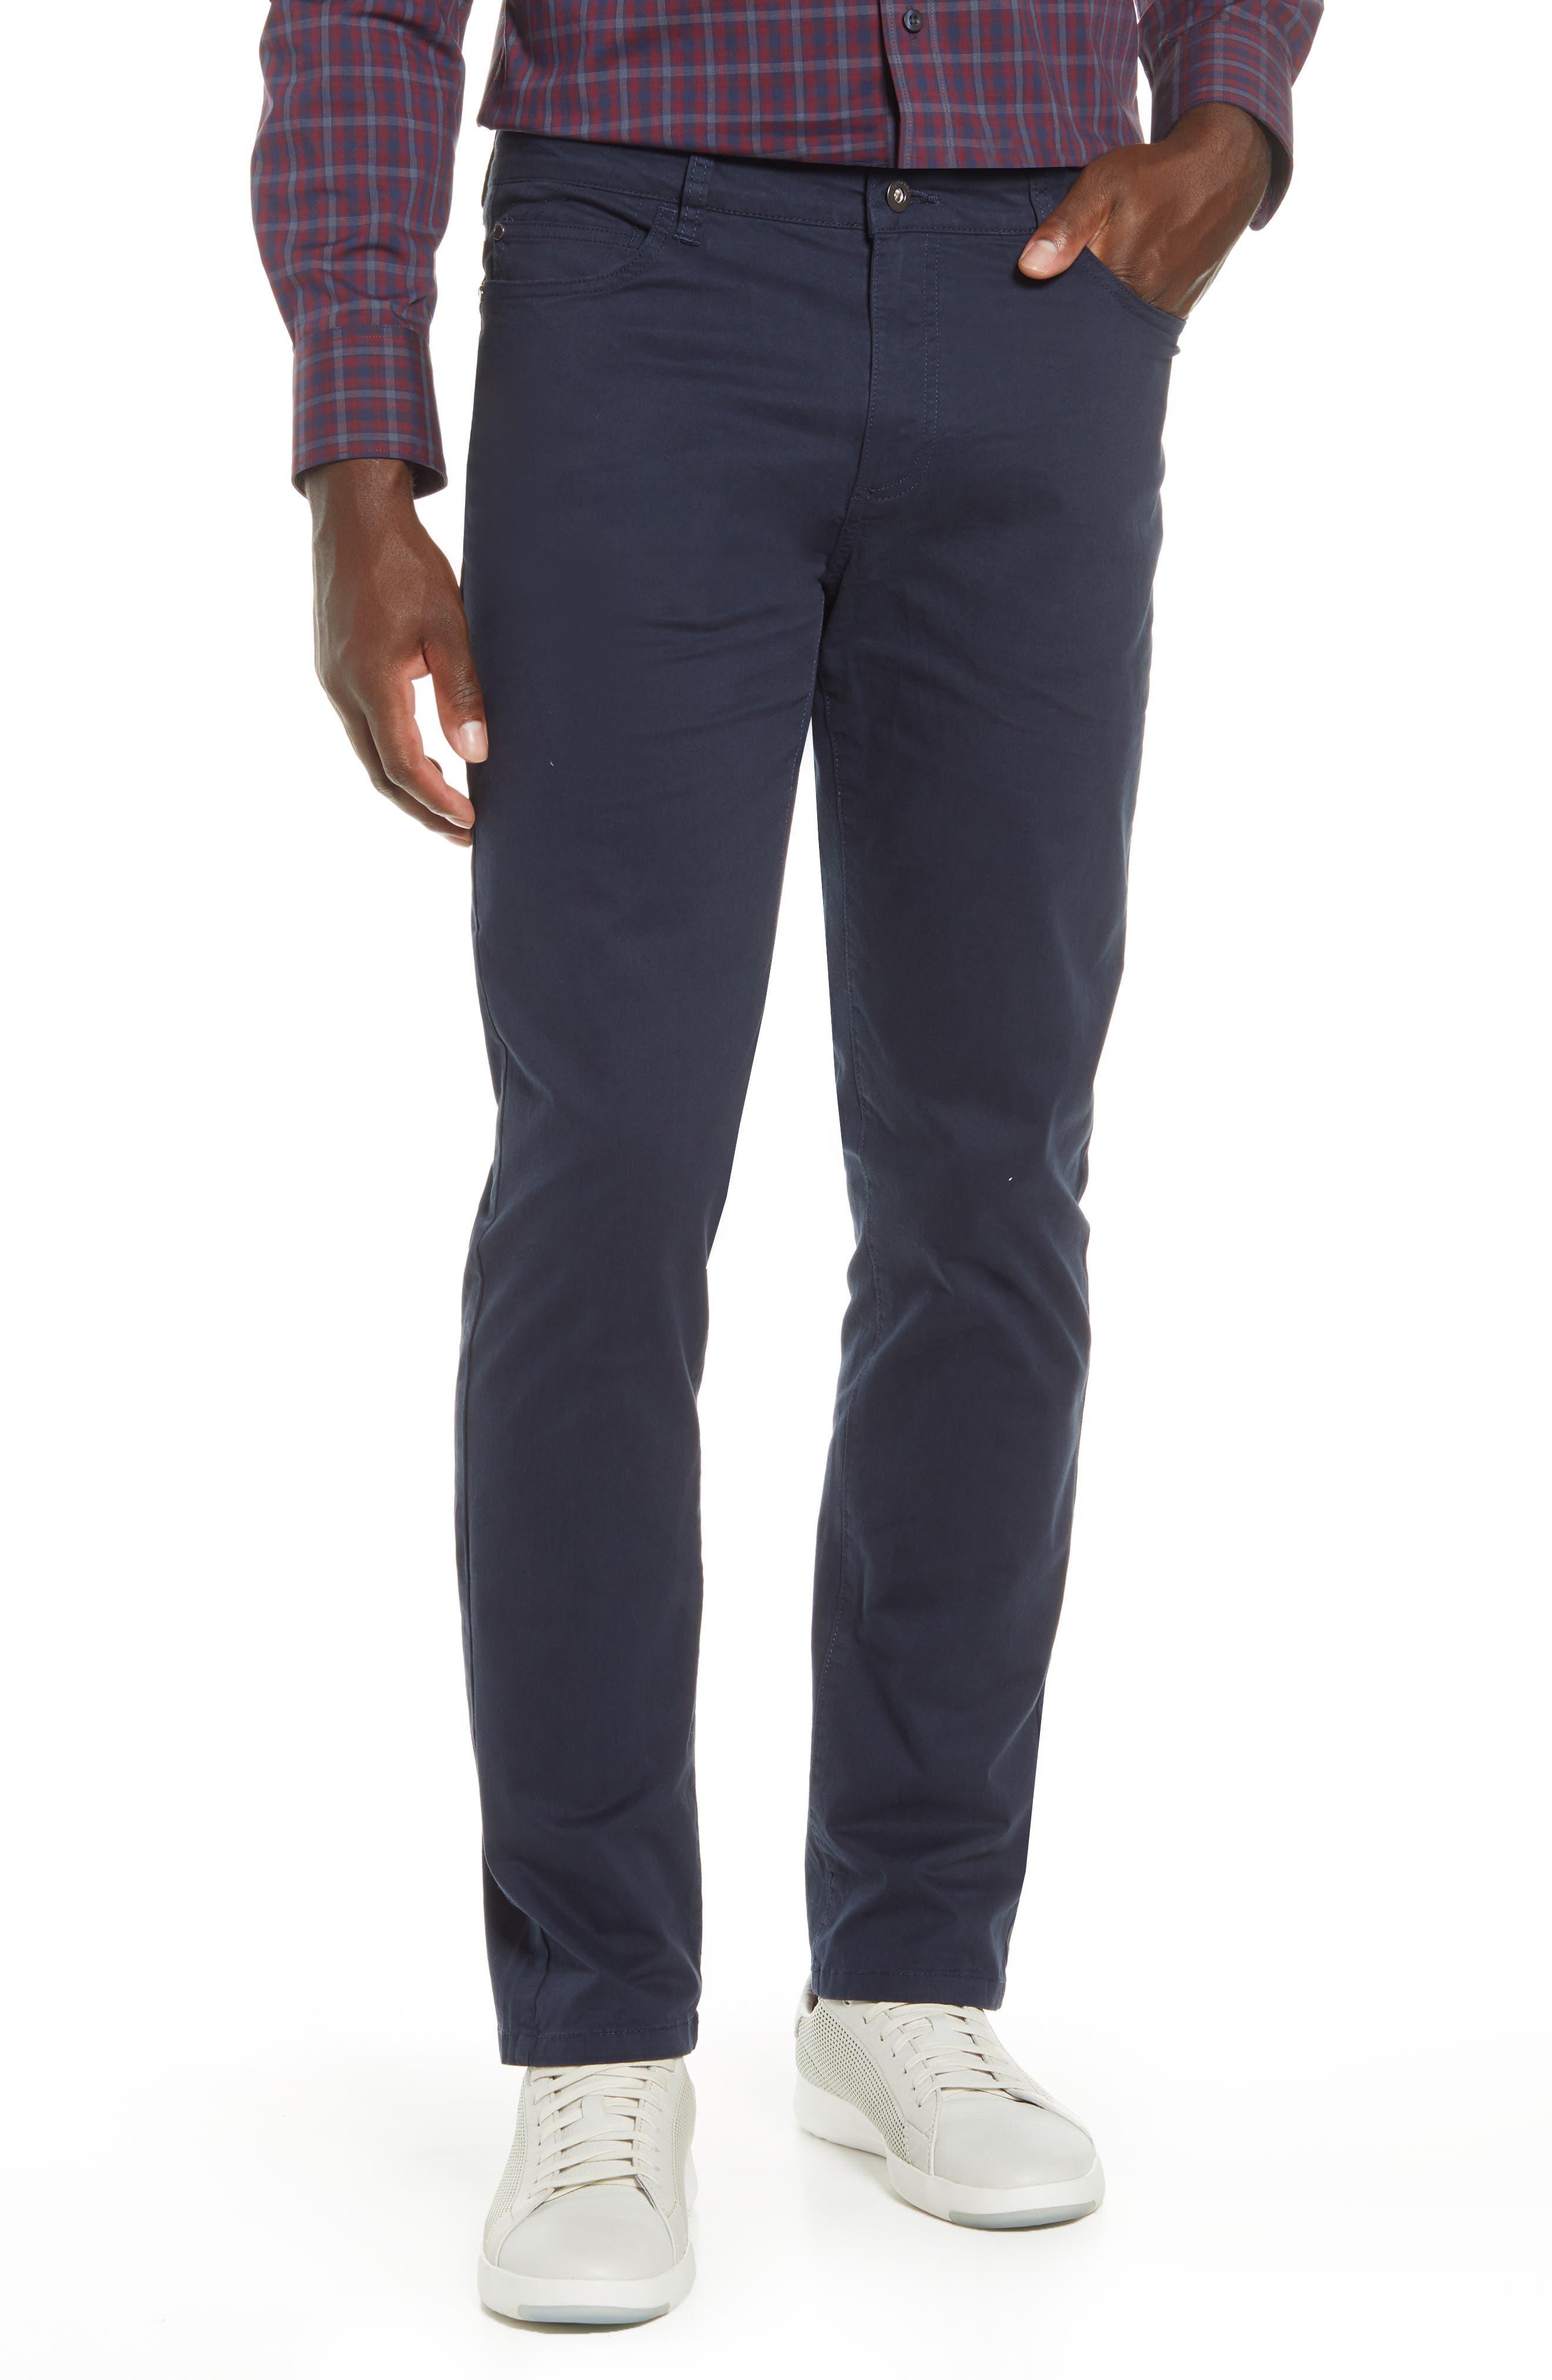 Men's Cutter & Buck Voyager Straight Leg Pants,  30 x 30 - Blue